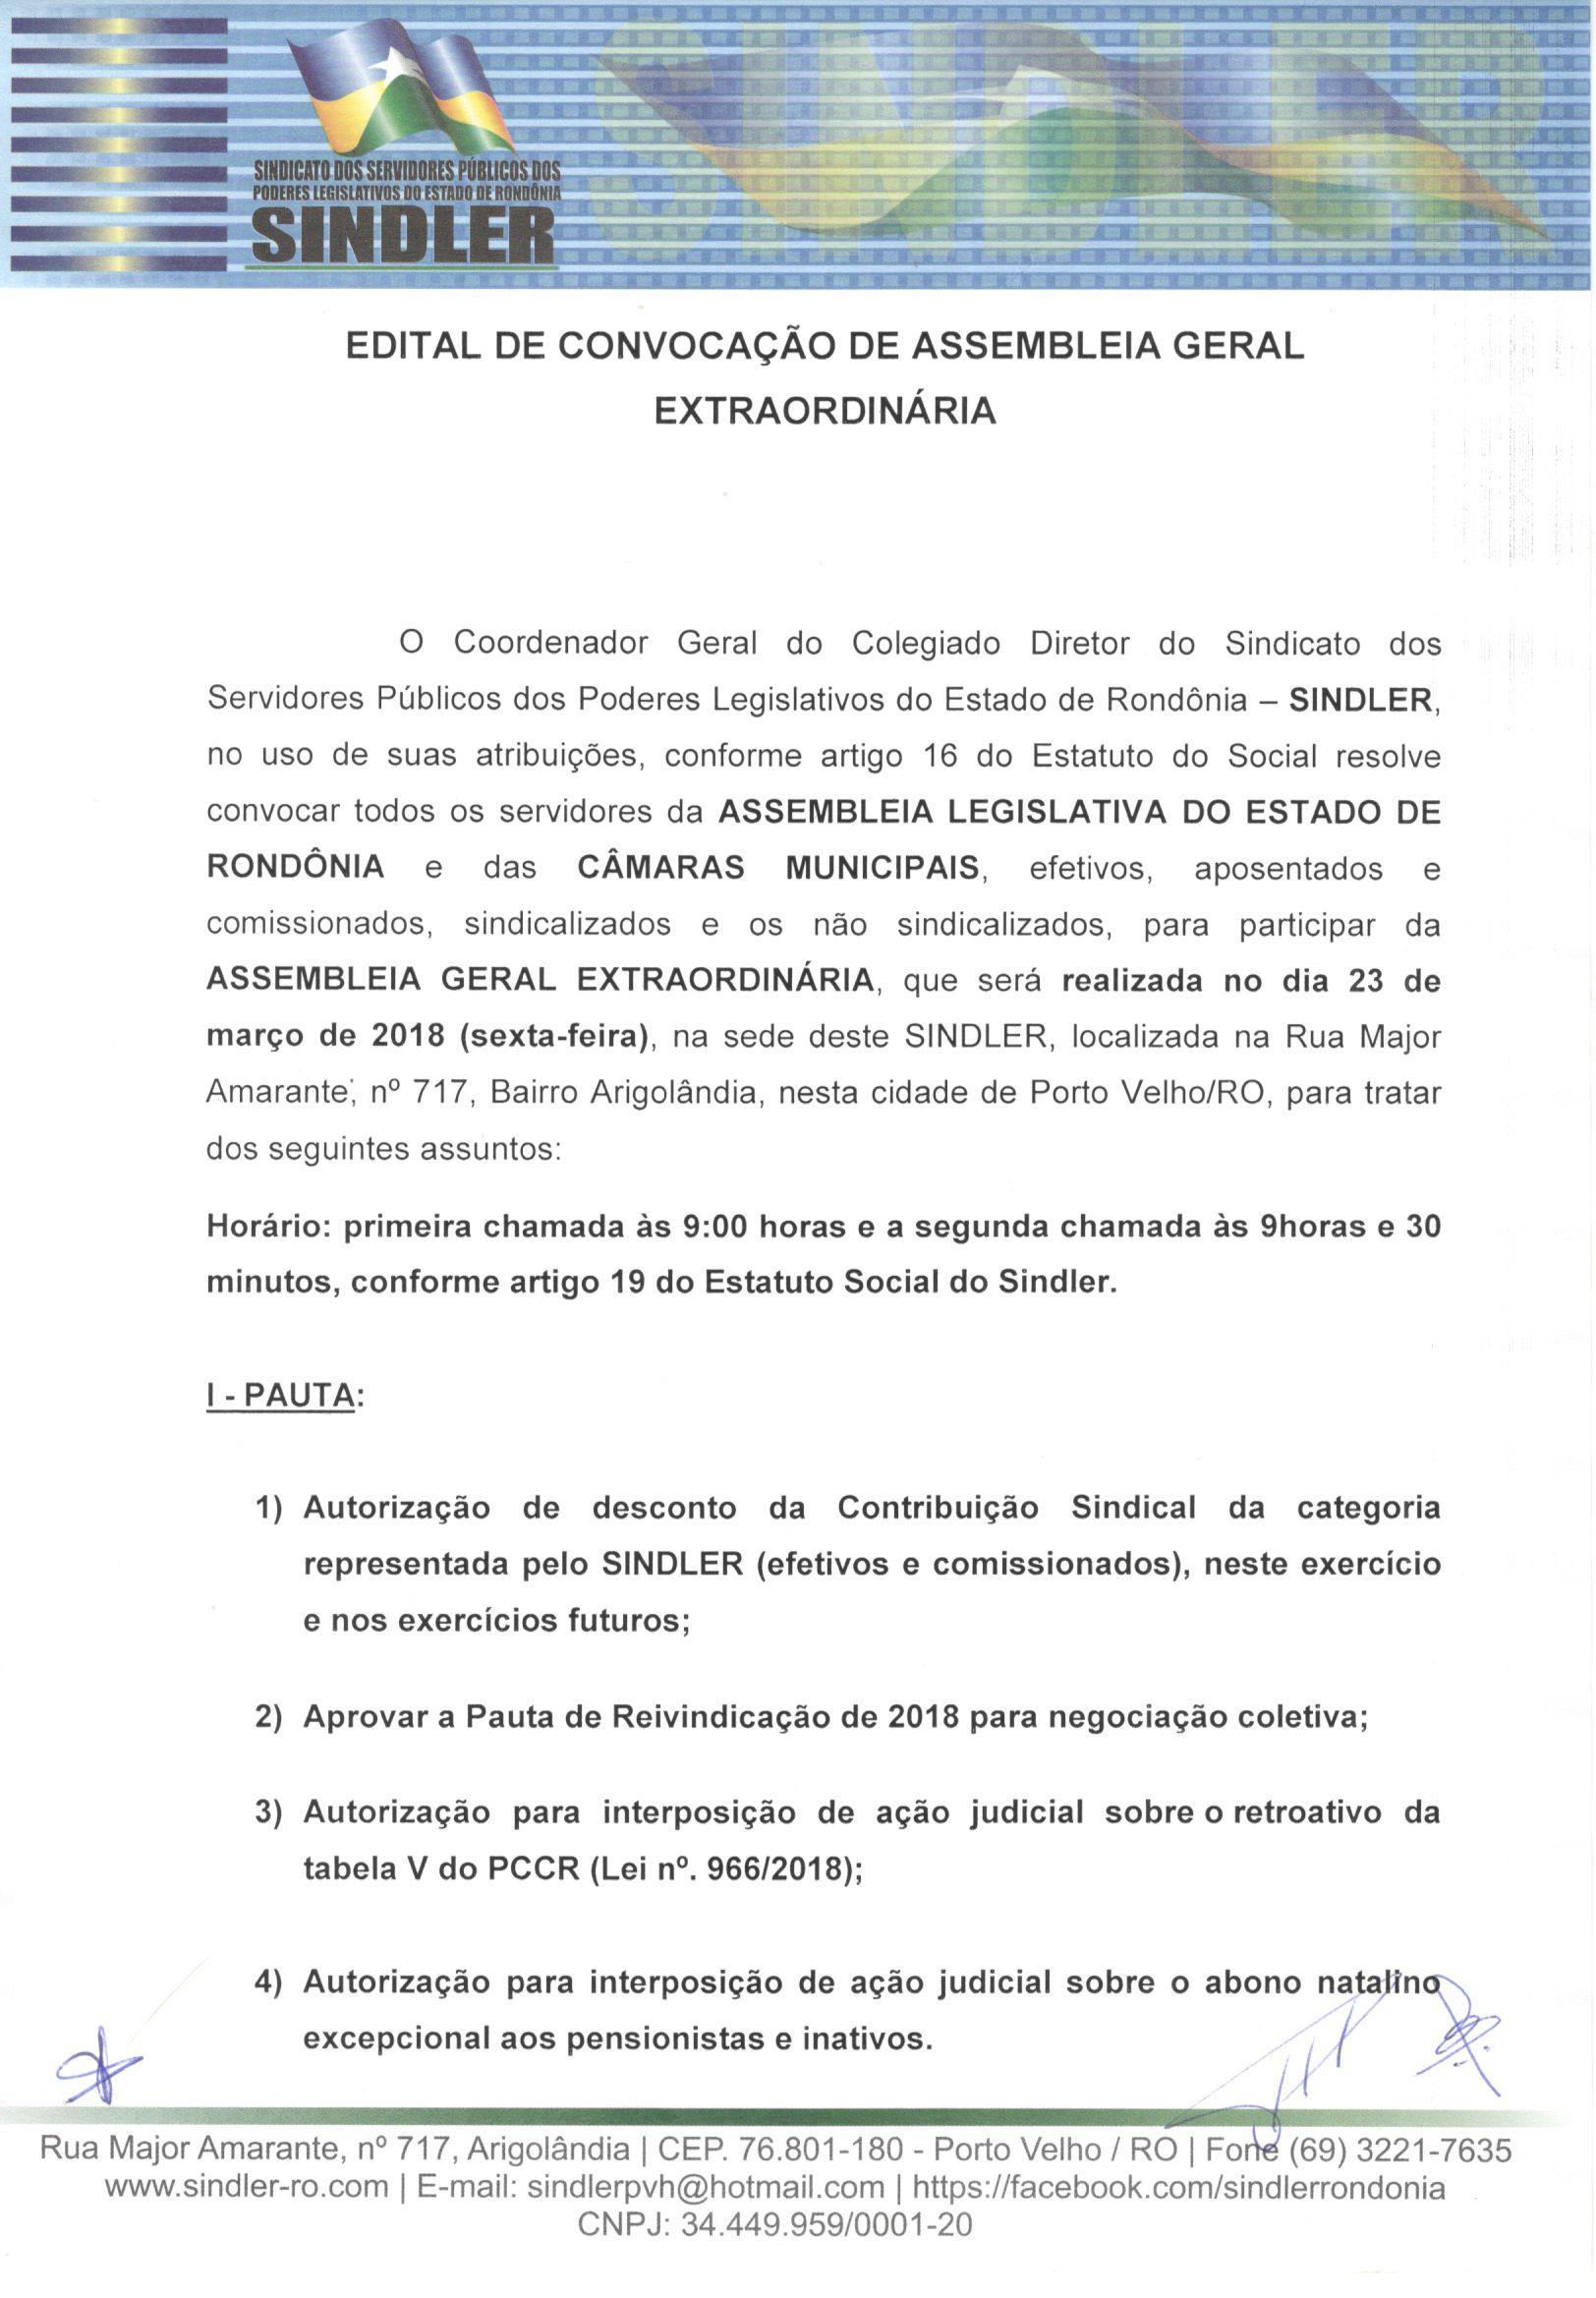 EDITAL CONVOCACAO AGE 23 MARCO2018 P1